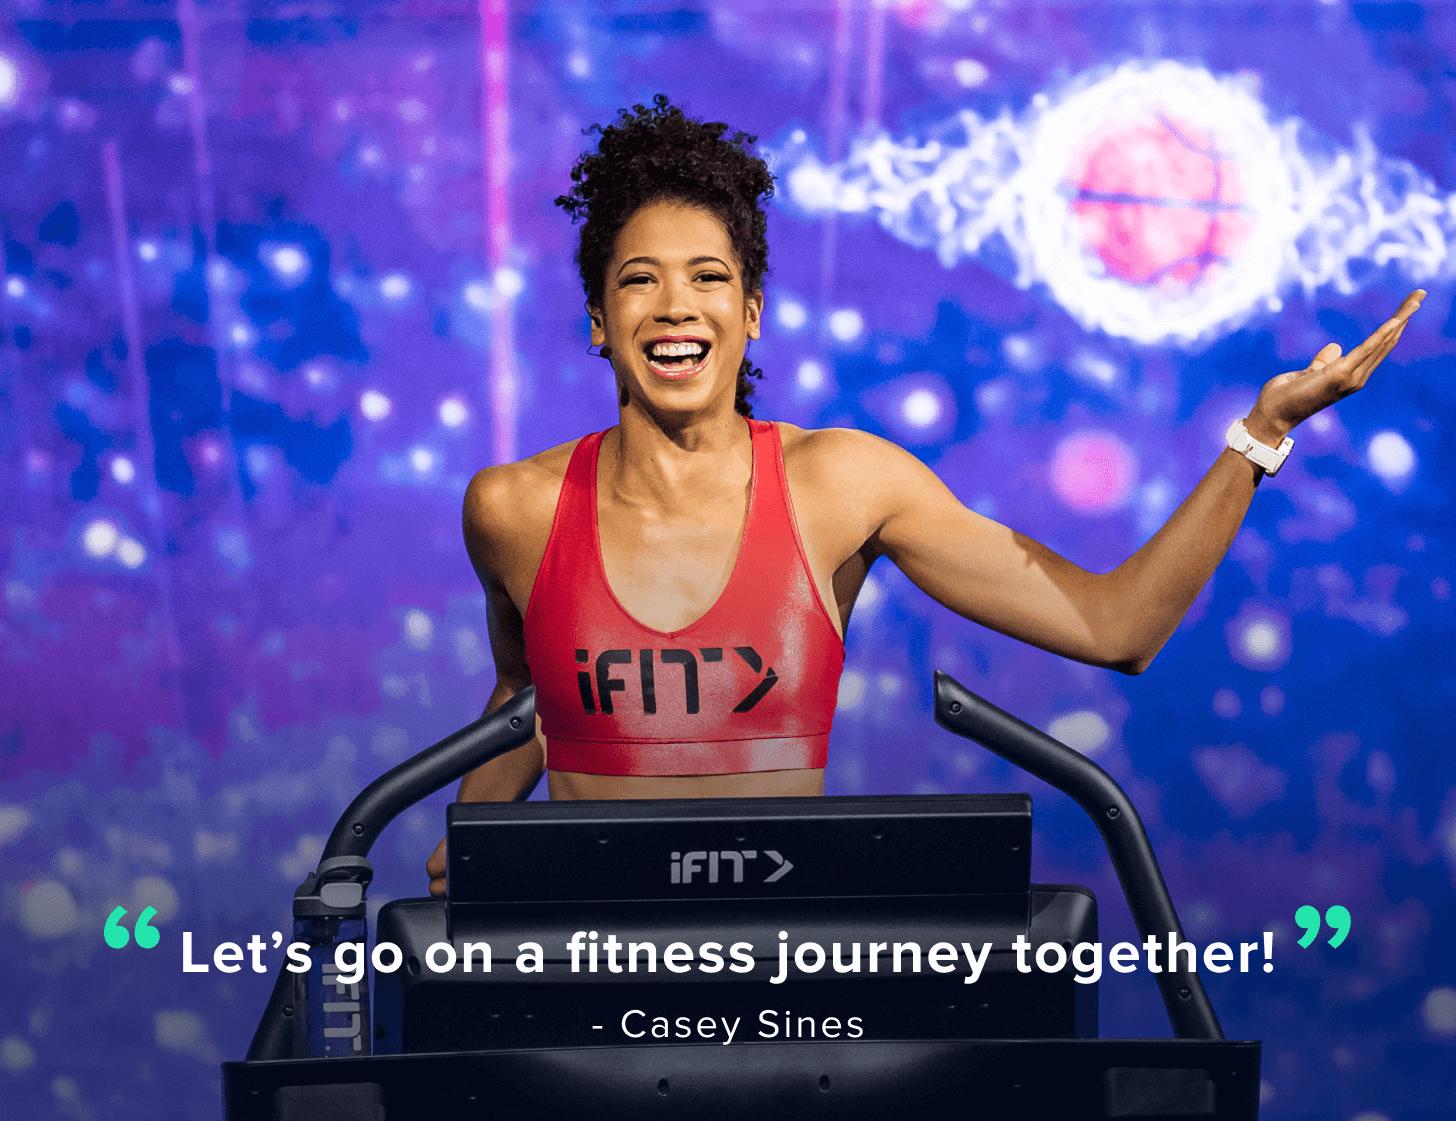 iFIT Trainer Casey Sines quote